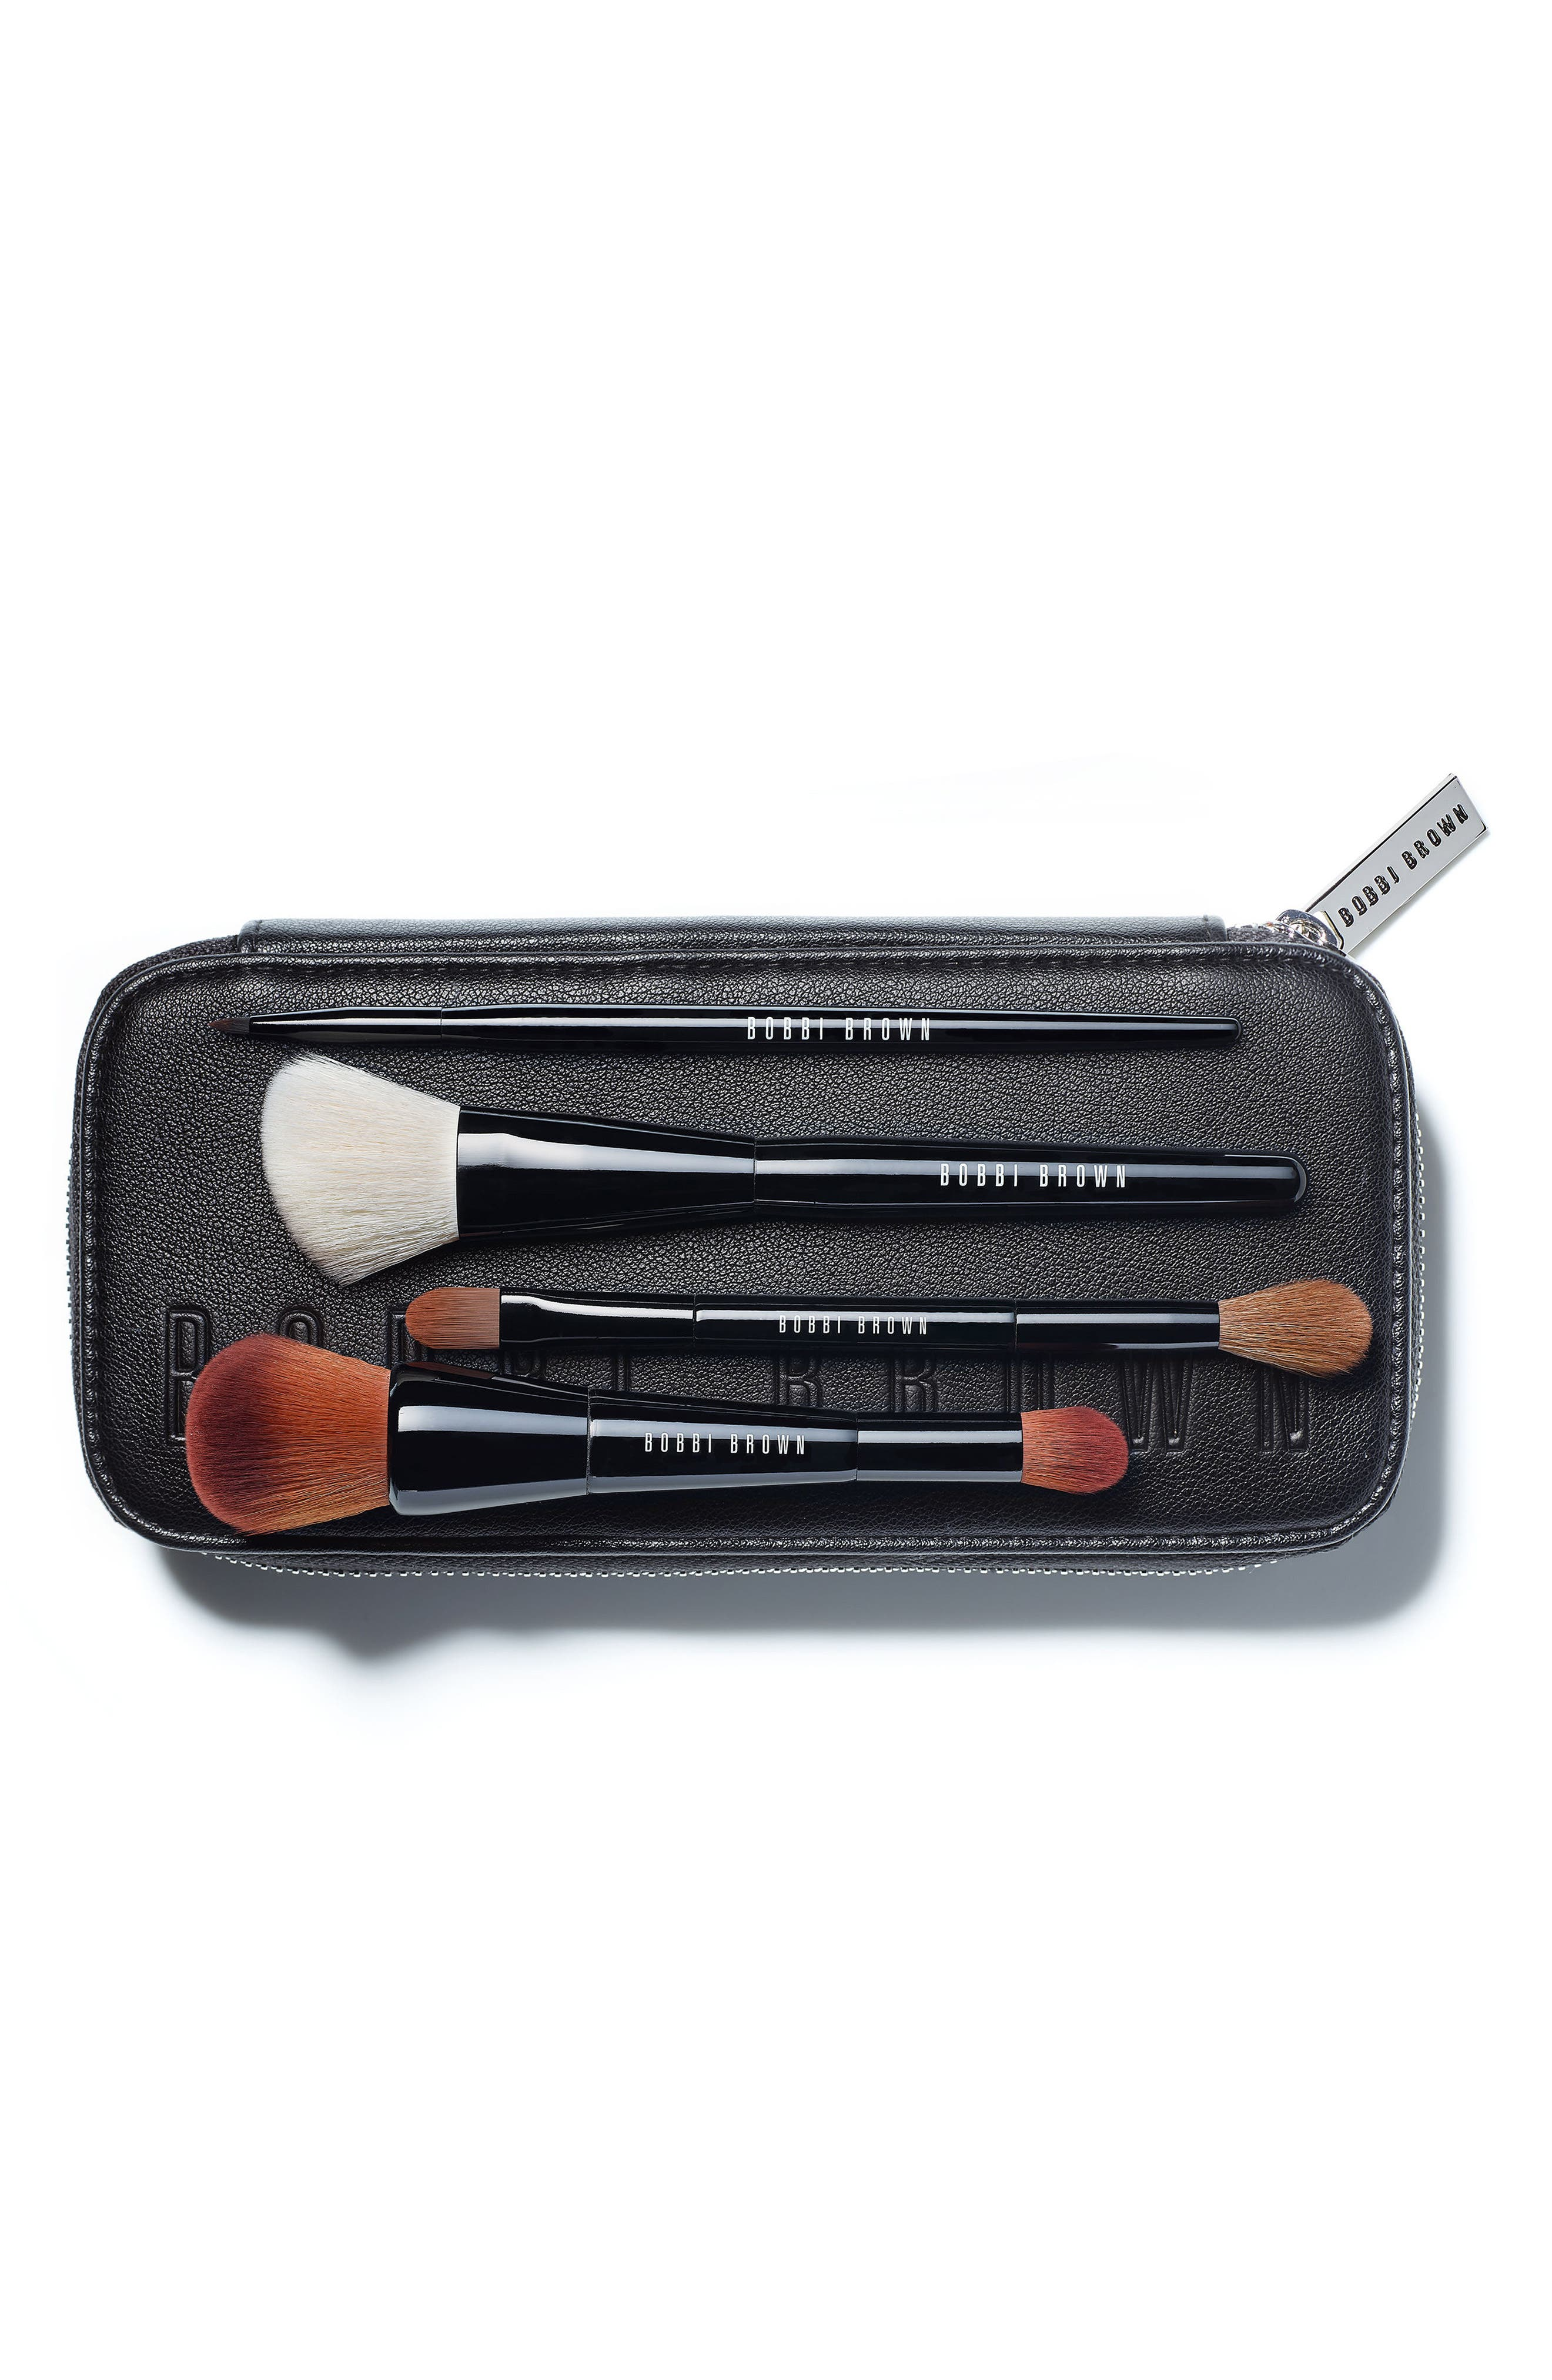 Pro Brush Set,                         Main,                         color, 000